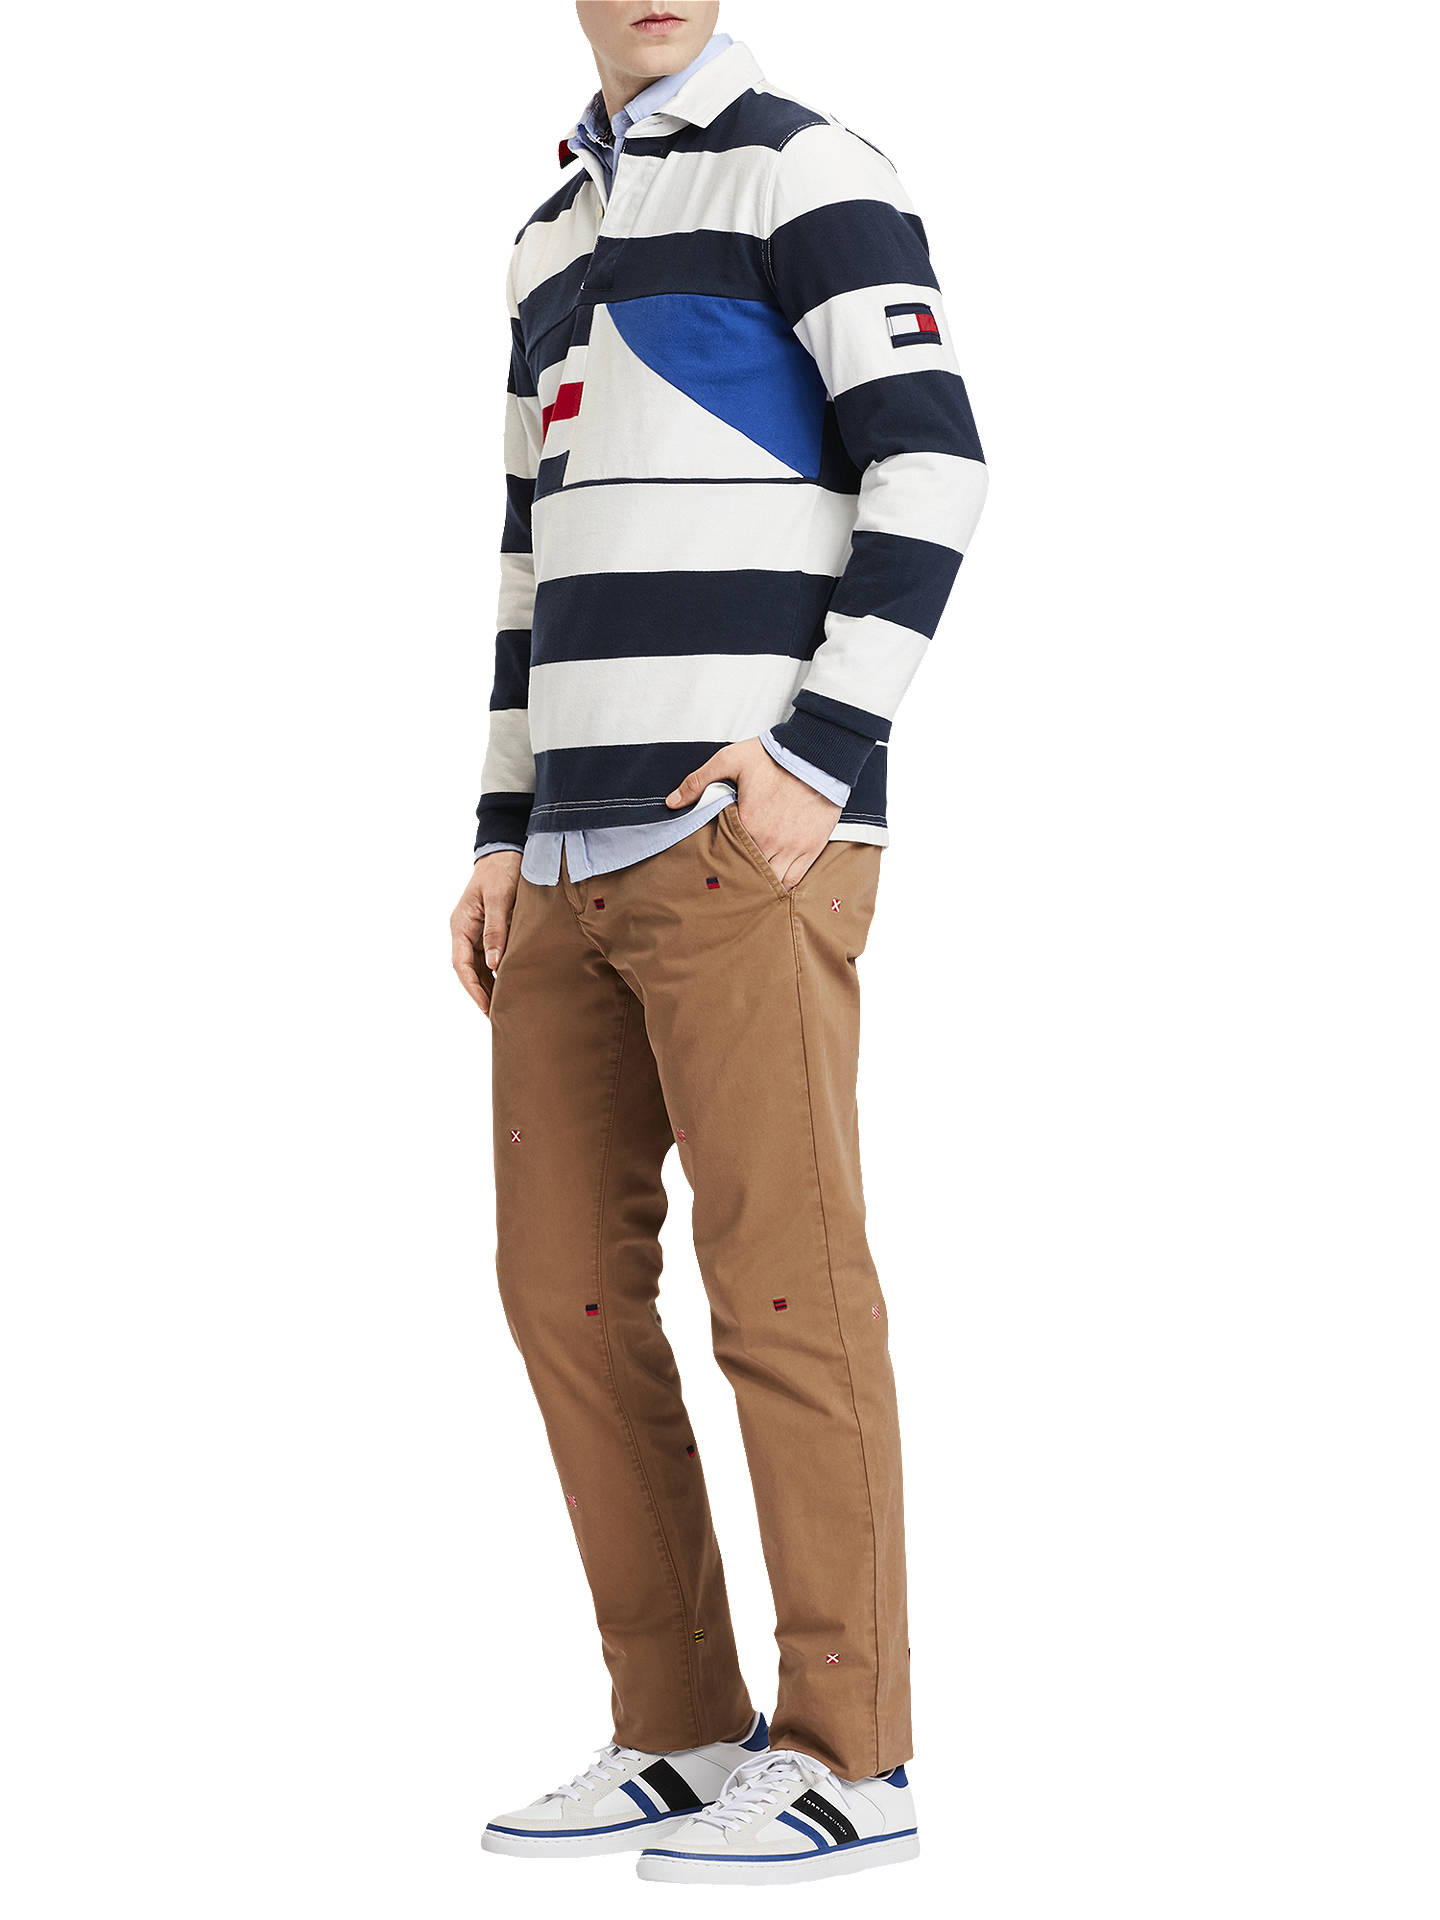 48fcb6ec Buy Tommy Hilfiger Ricky Stripe Rugby Shirt, Navy/White, M Online at  johnlewis ...